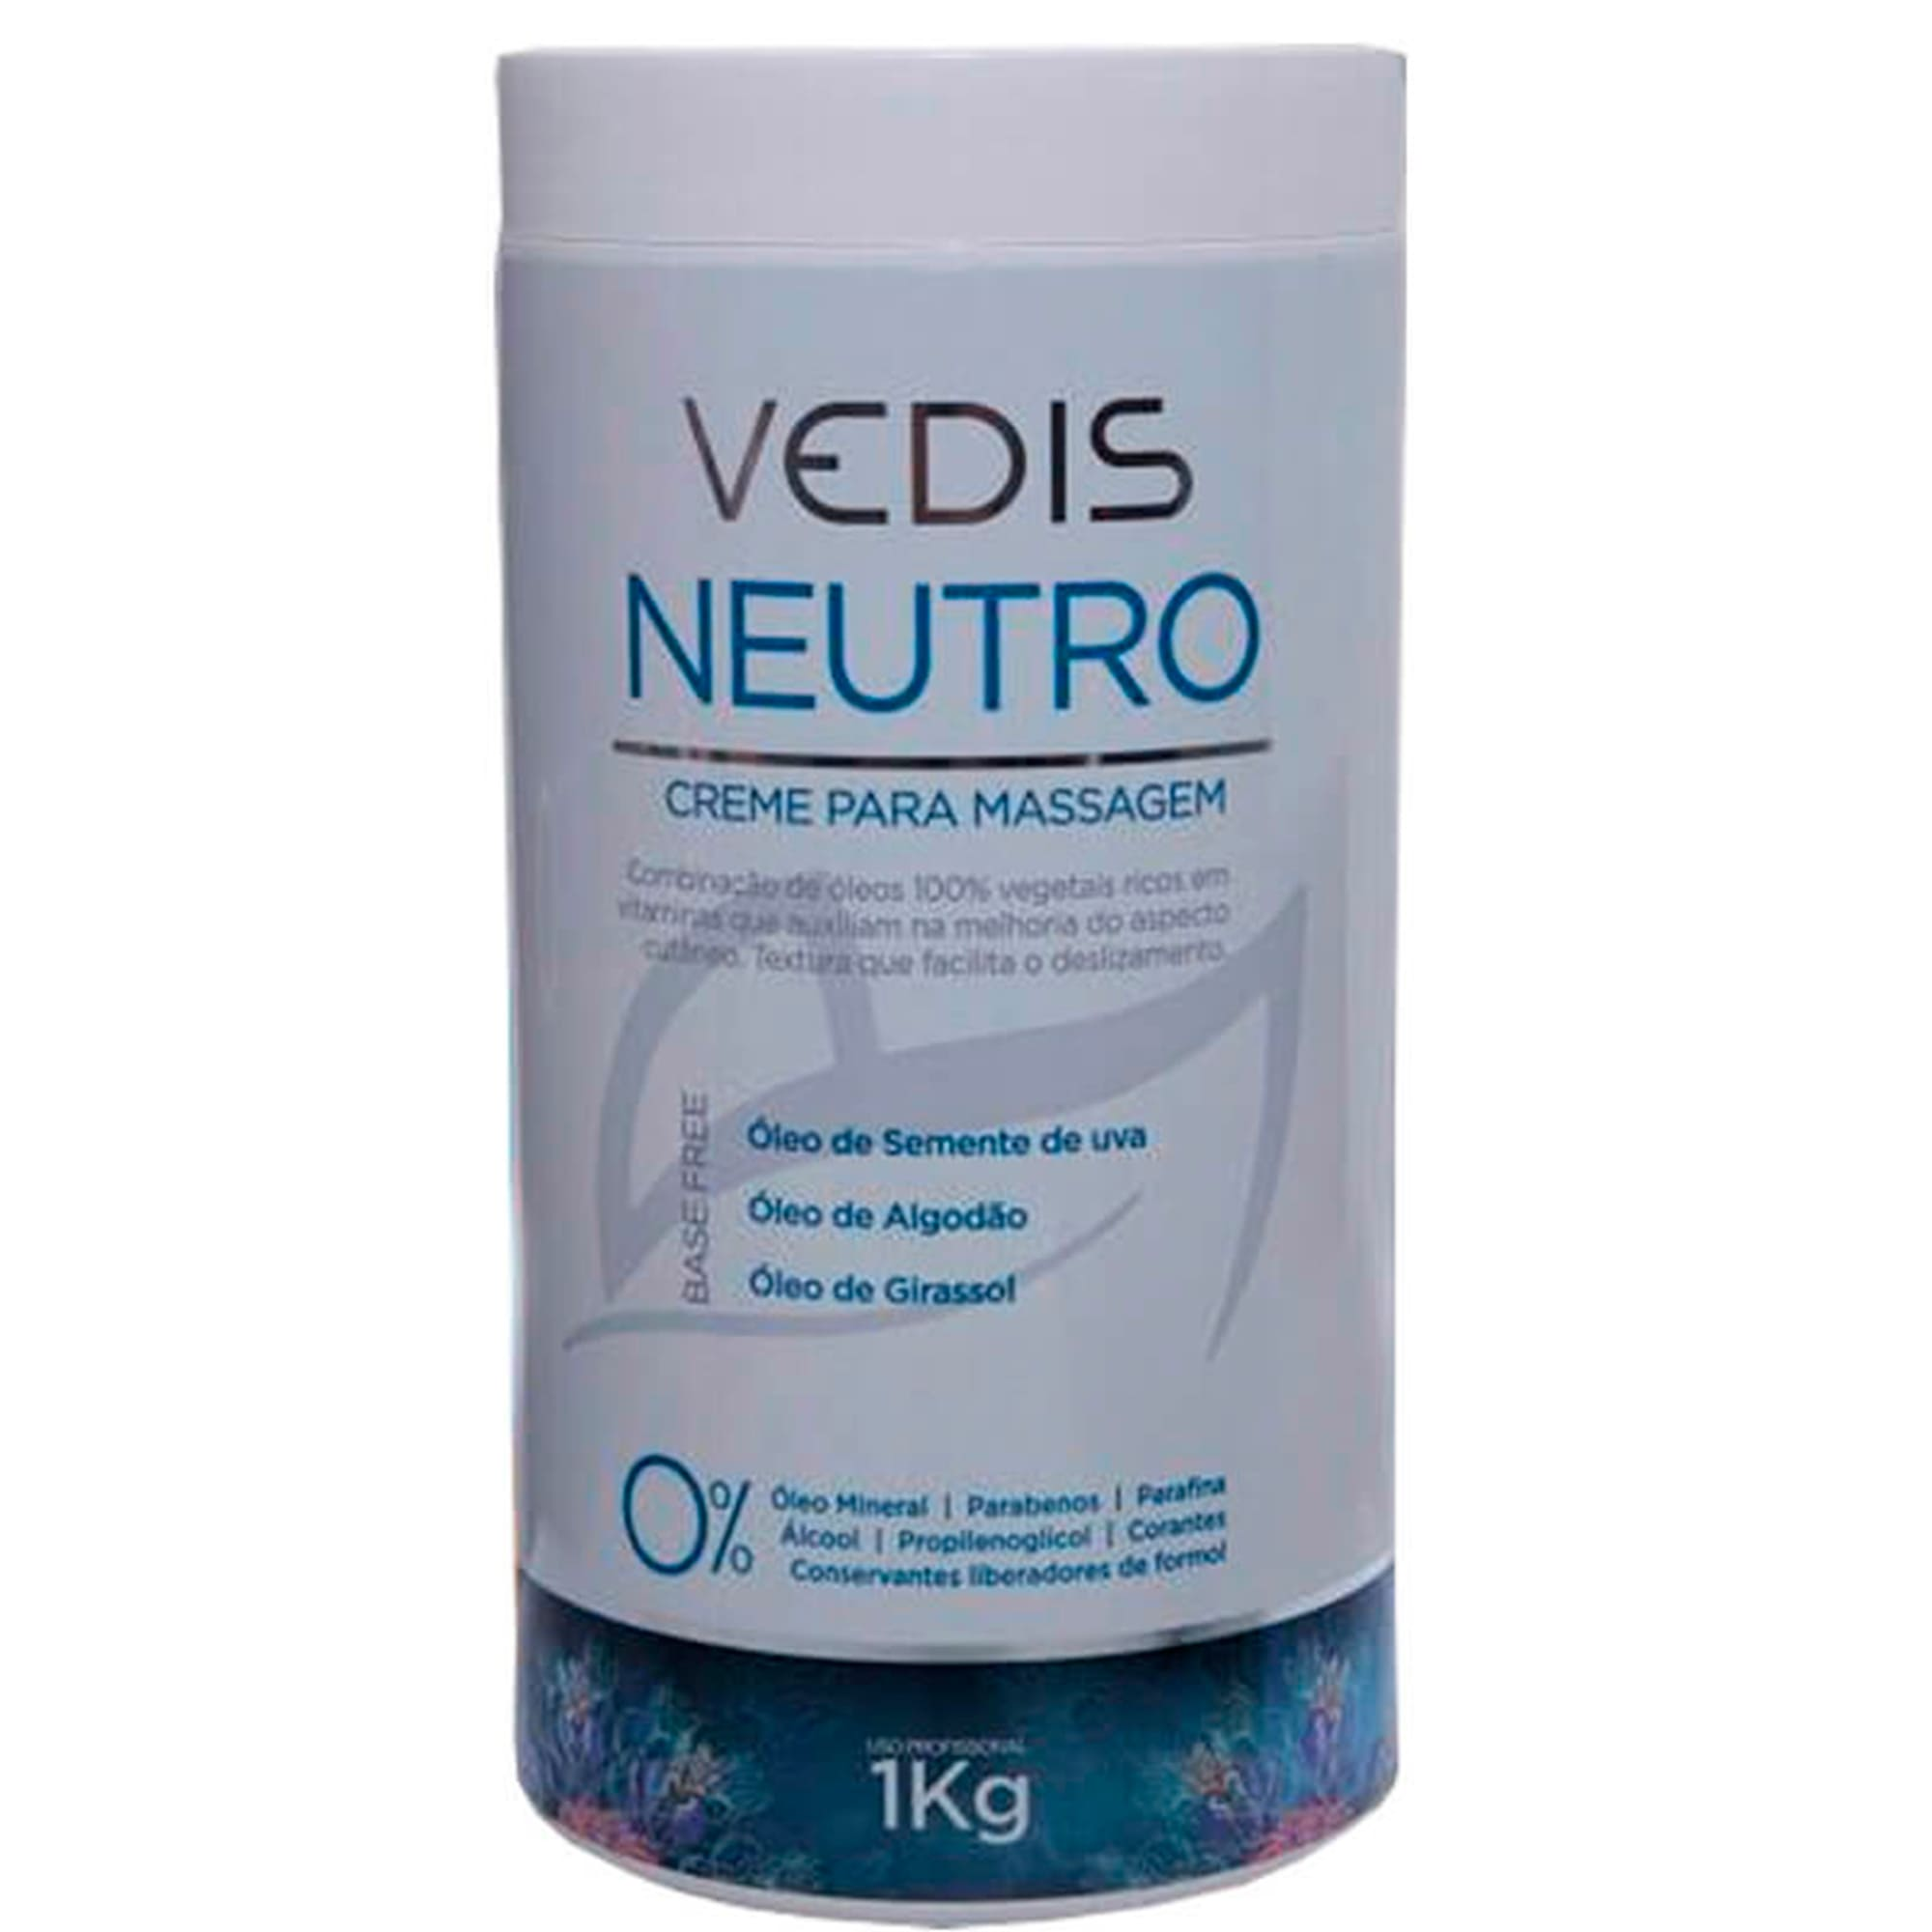 Creme Neutro Para Massagem 1kg - Vedis